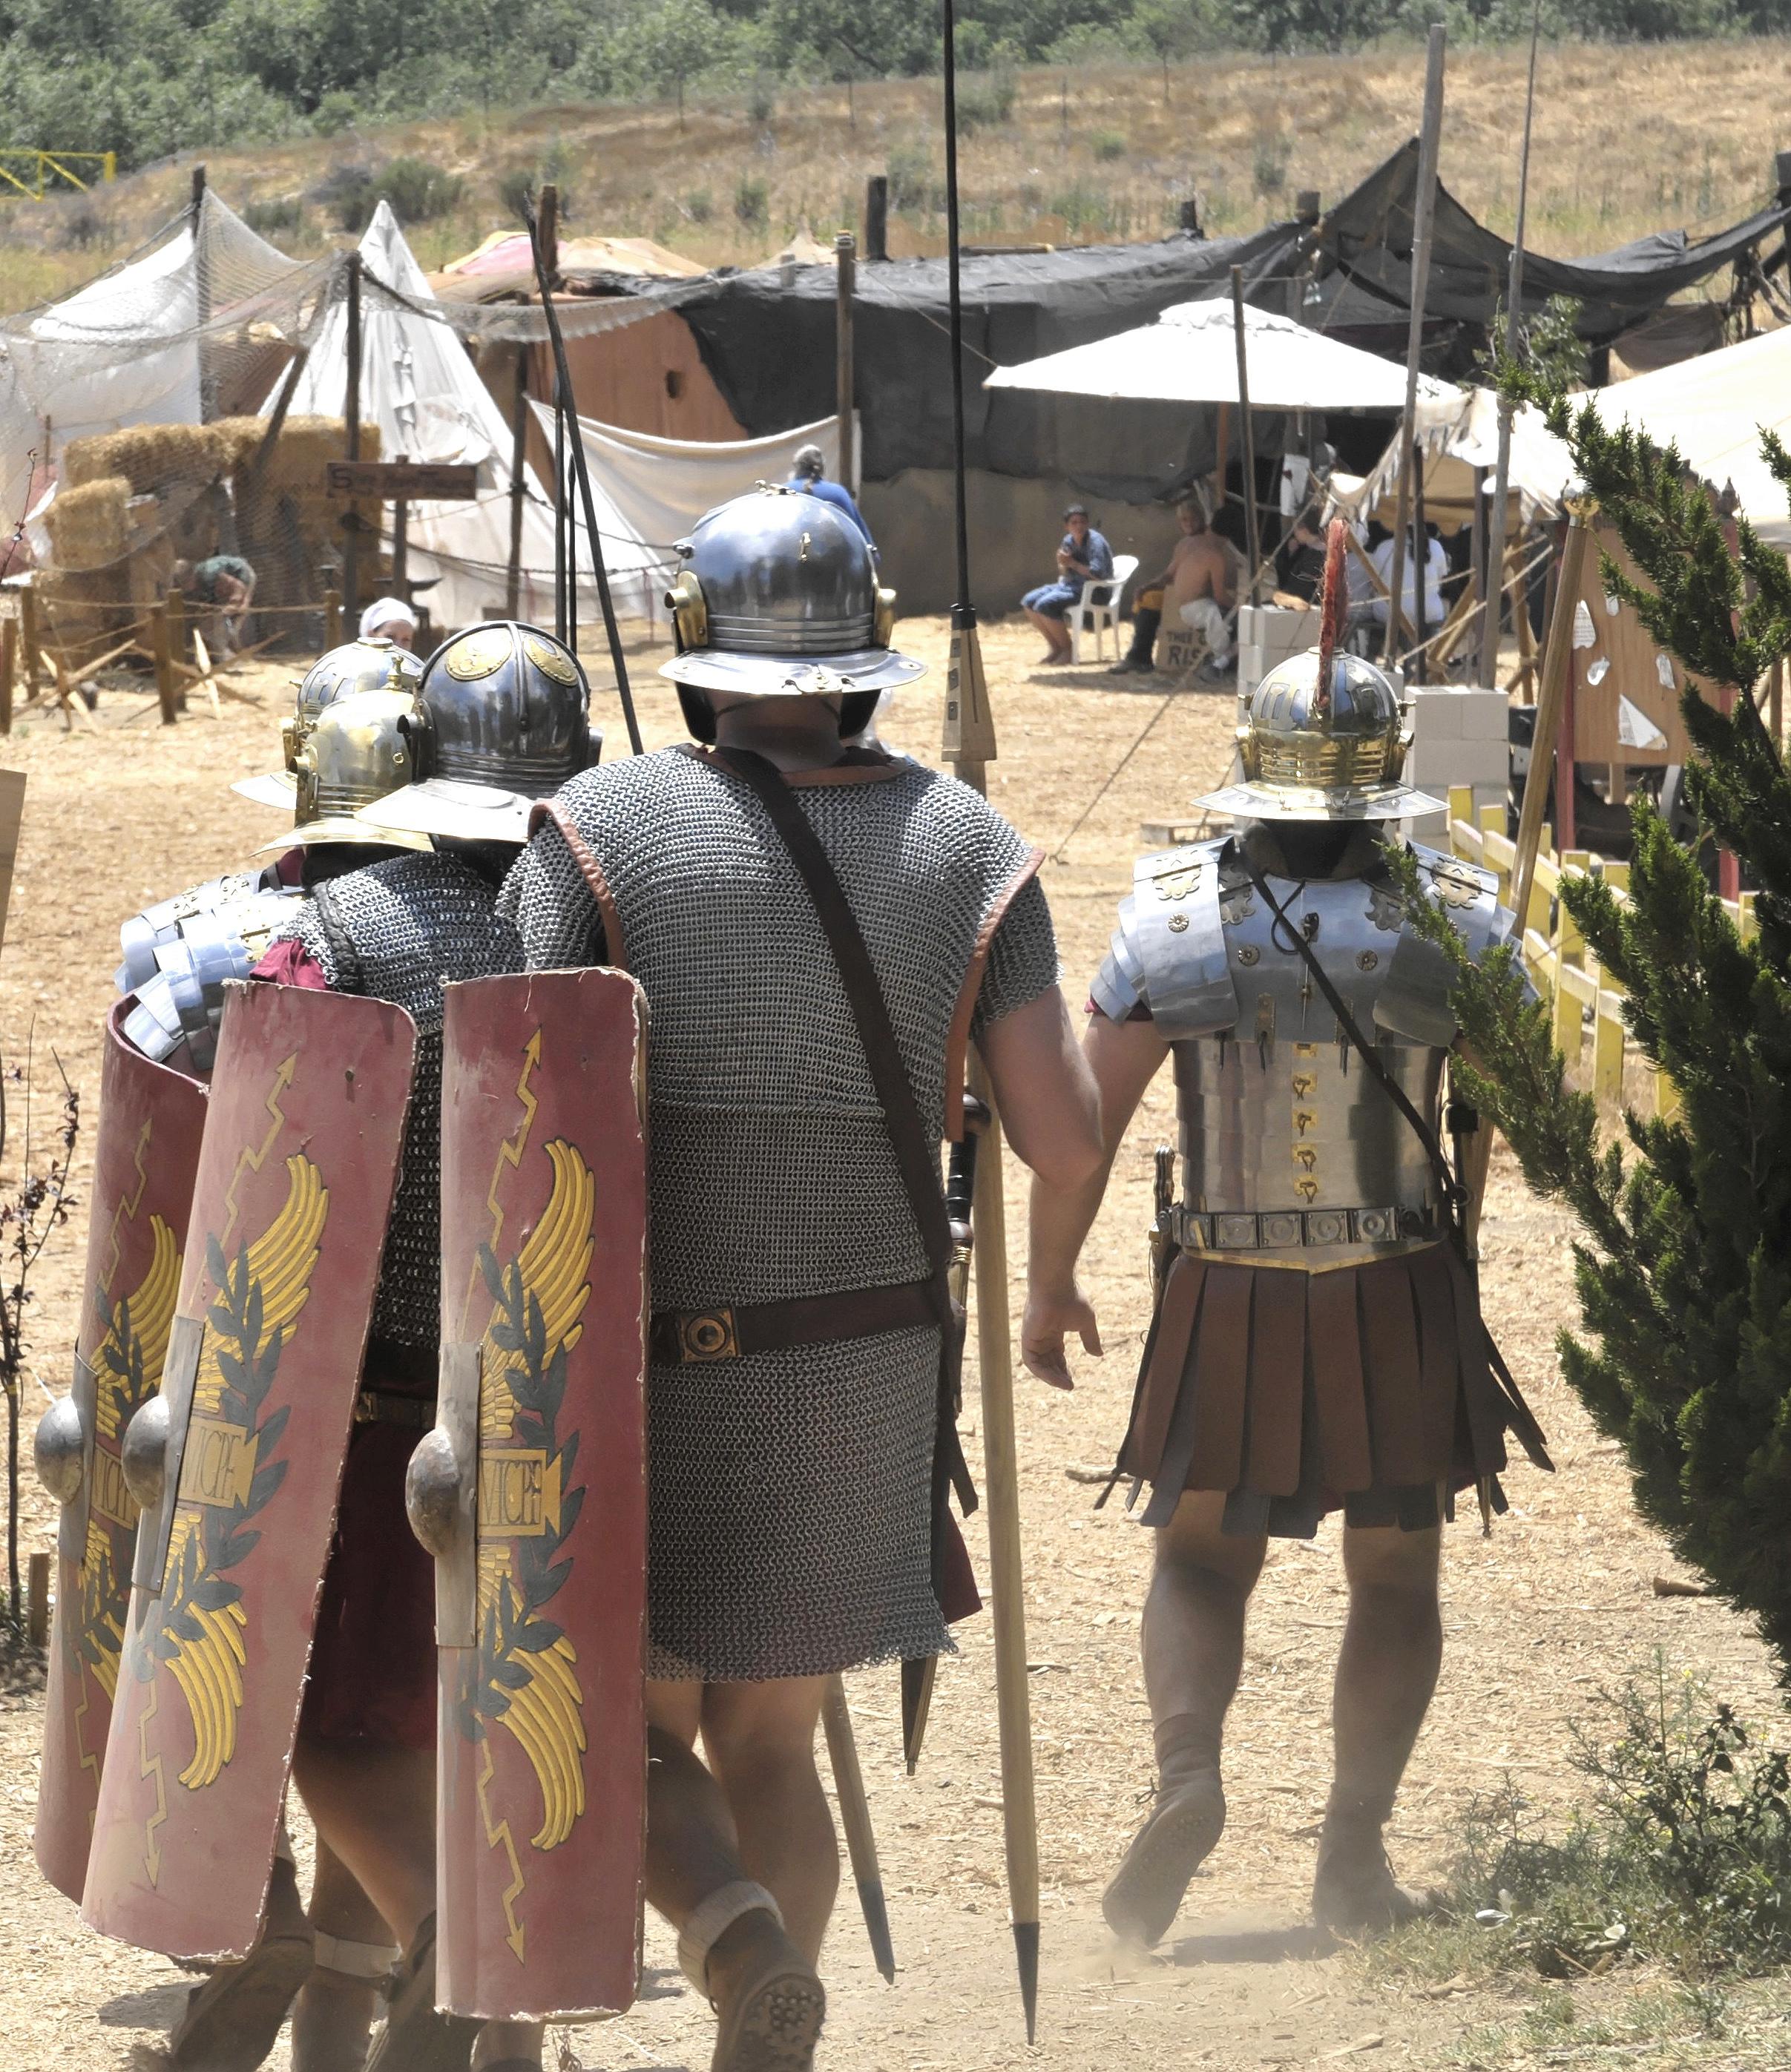 Roman soldier reenactors in camp. Photo courtesy of Adobe Stock.